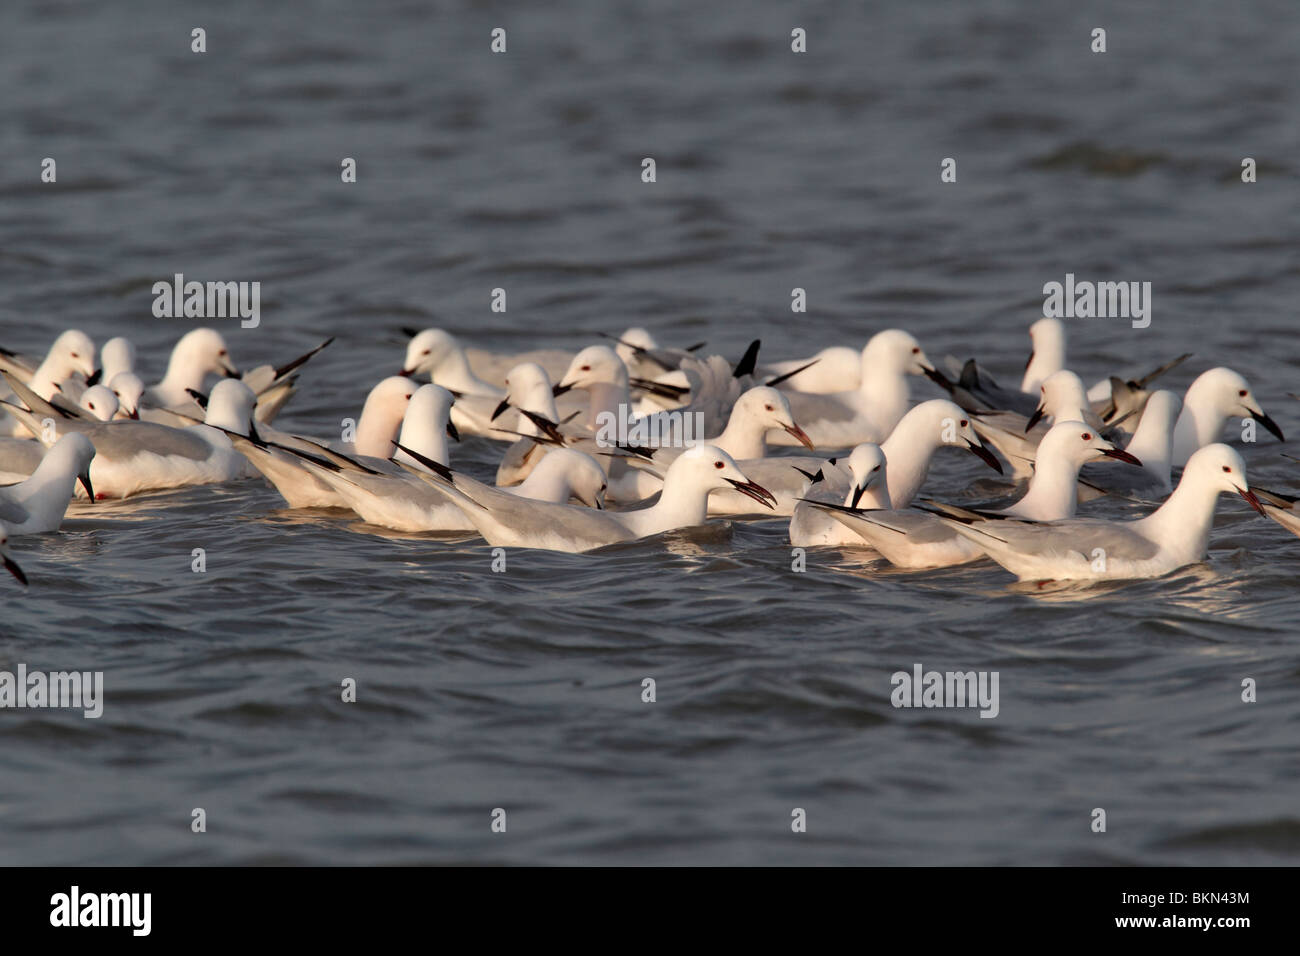 Slender-billed gull, Larus genei, flock of birds feeding on water, Southern Spain, April 2010 Stock Photo